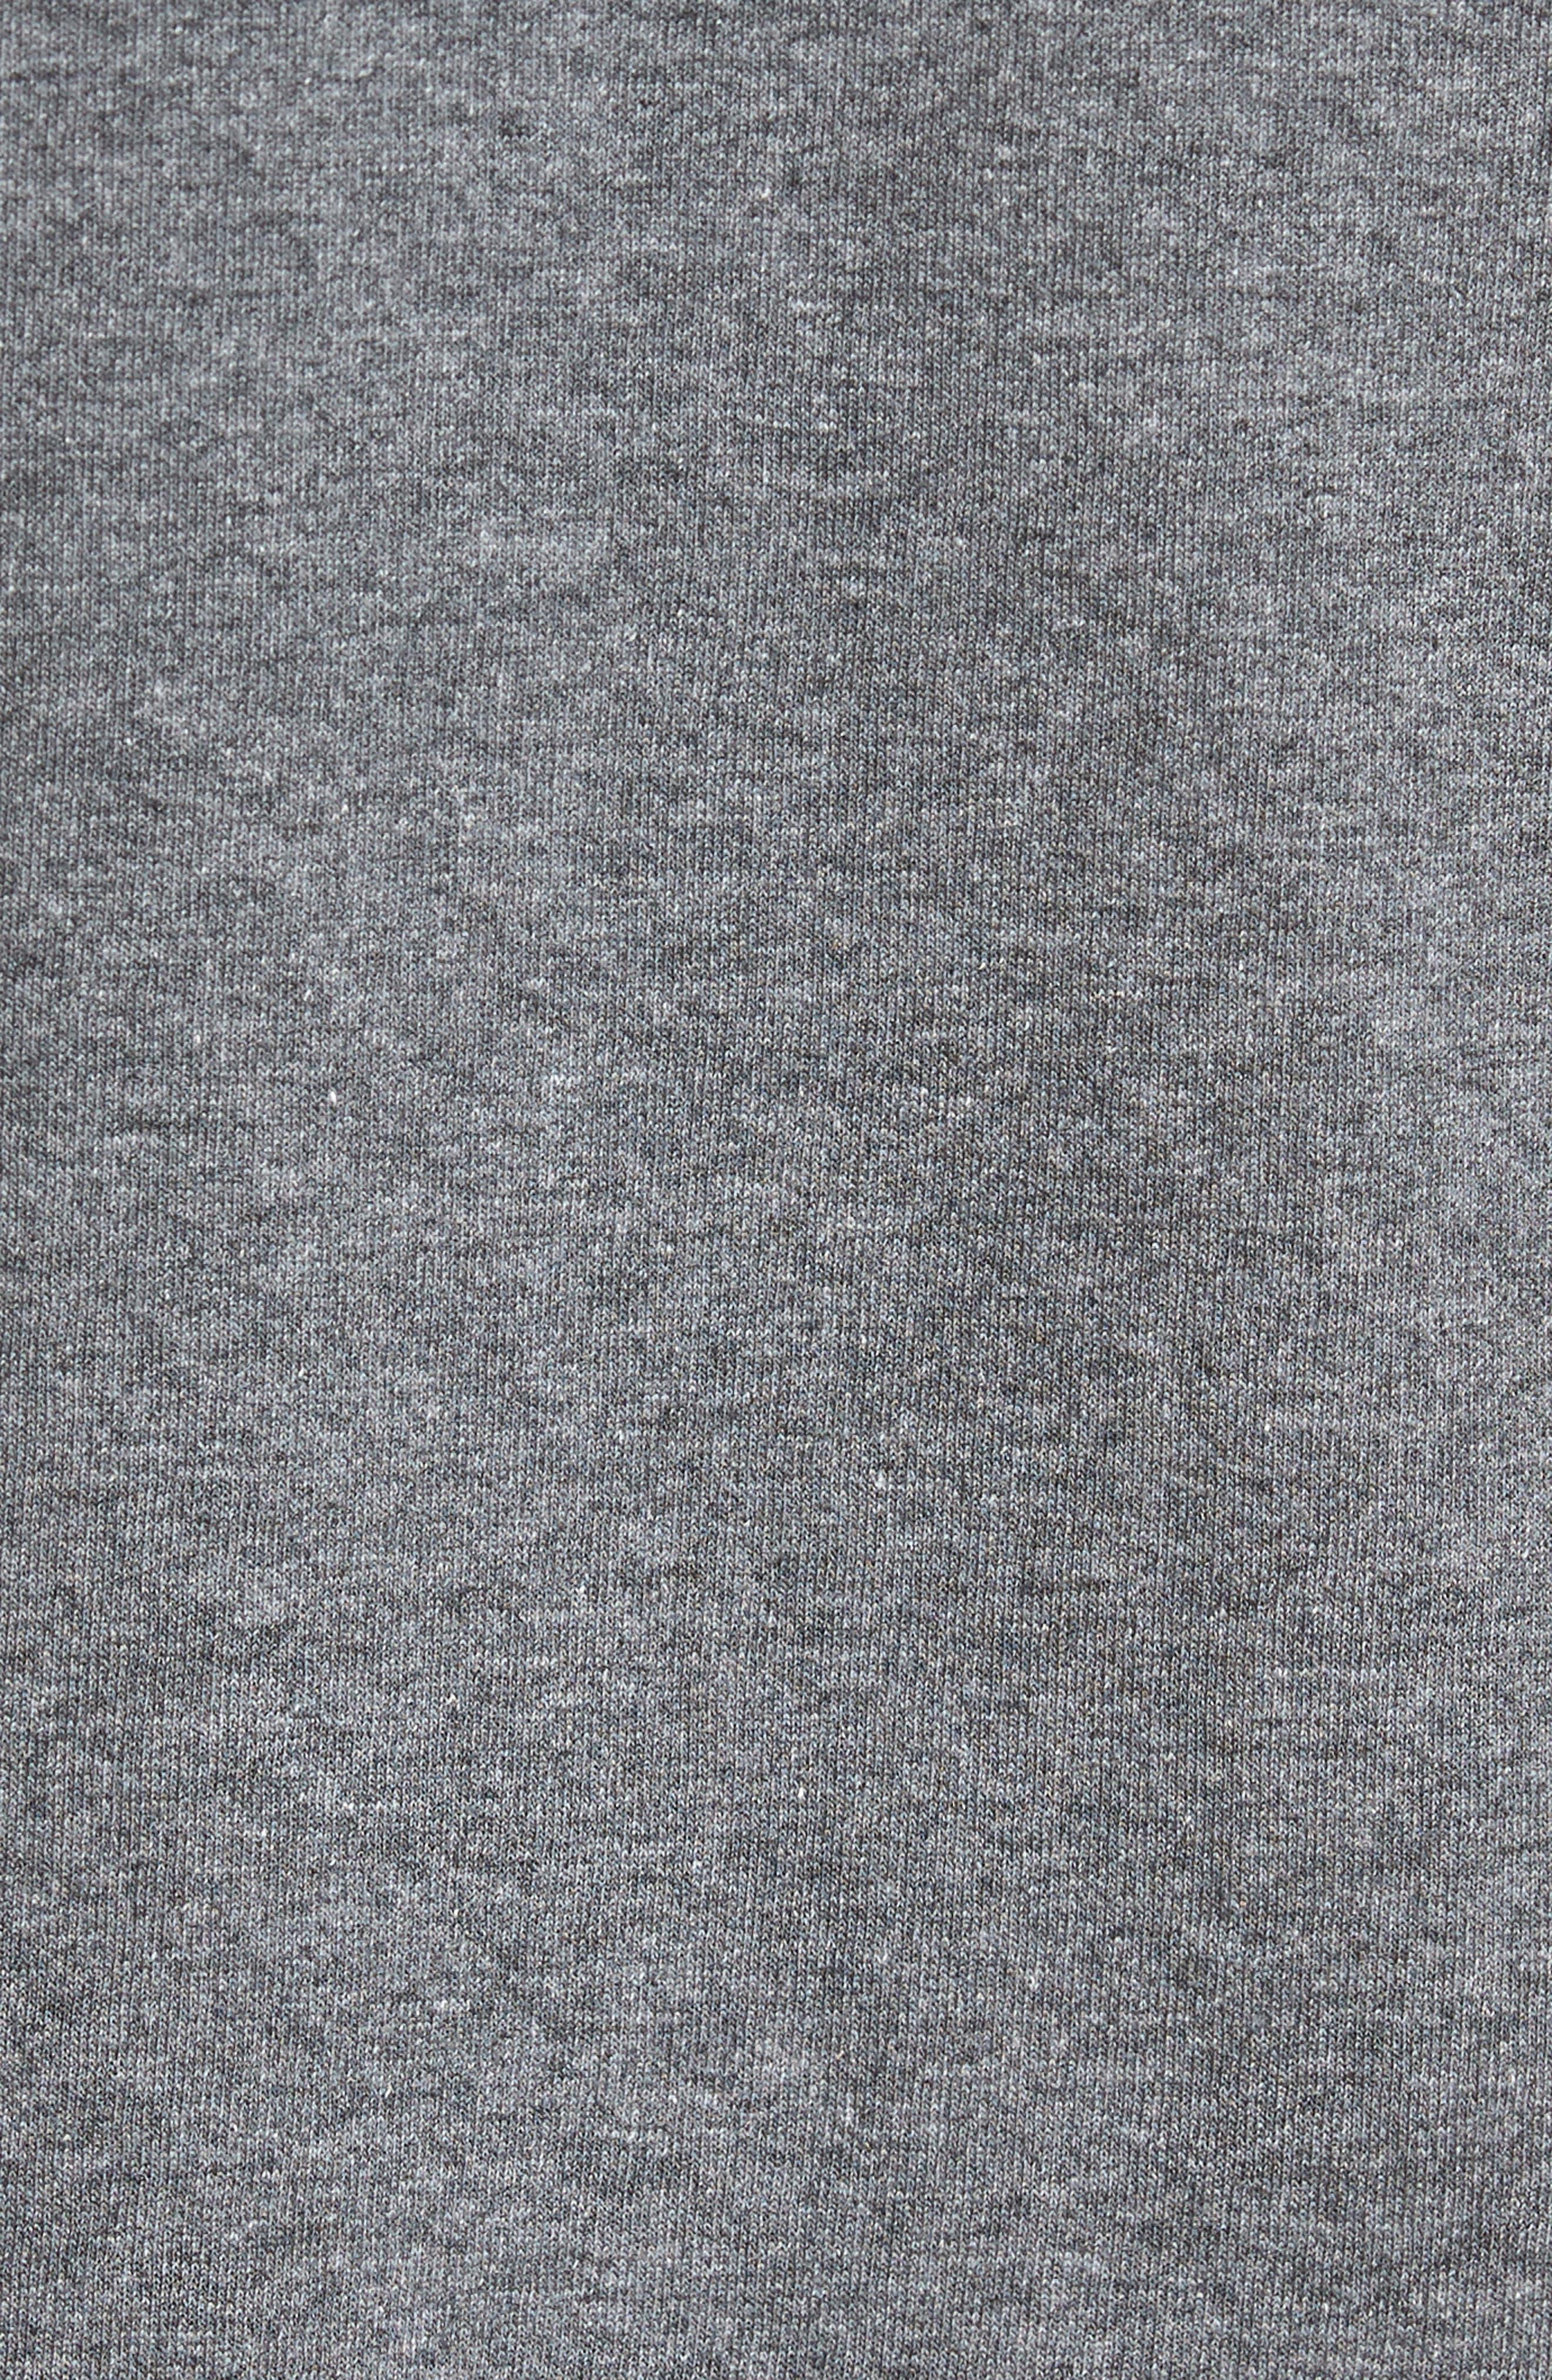 Misfits Short Sleeve T-Shirt,                             Alternate thumbnail 5, color,                             Black Misfits Ouija